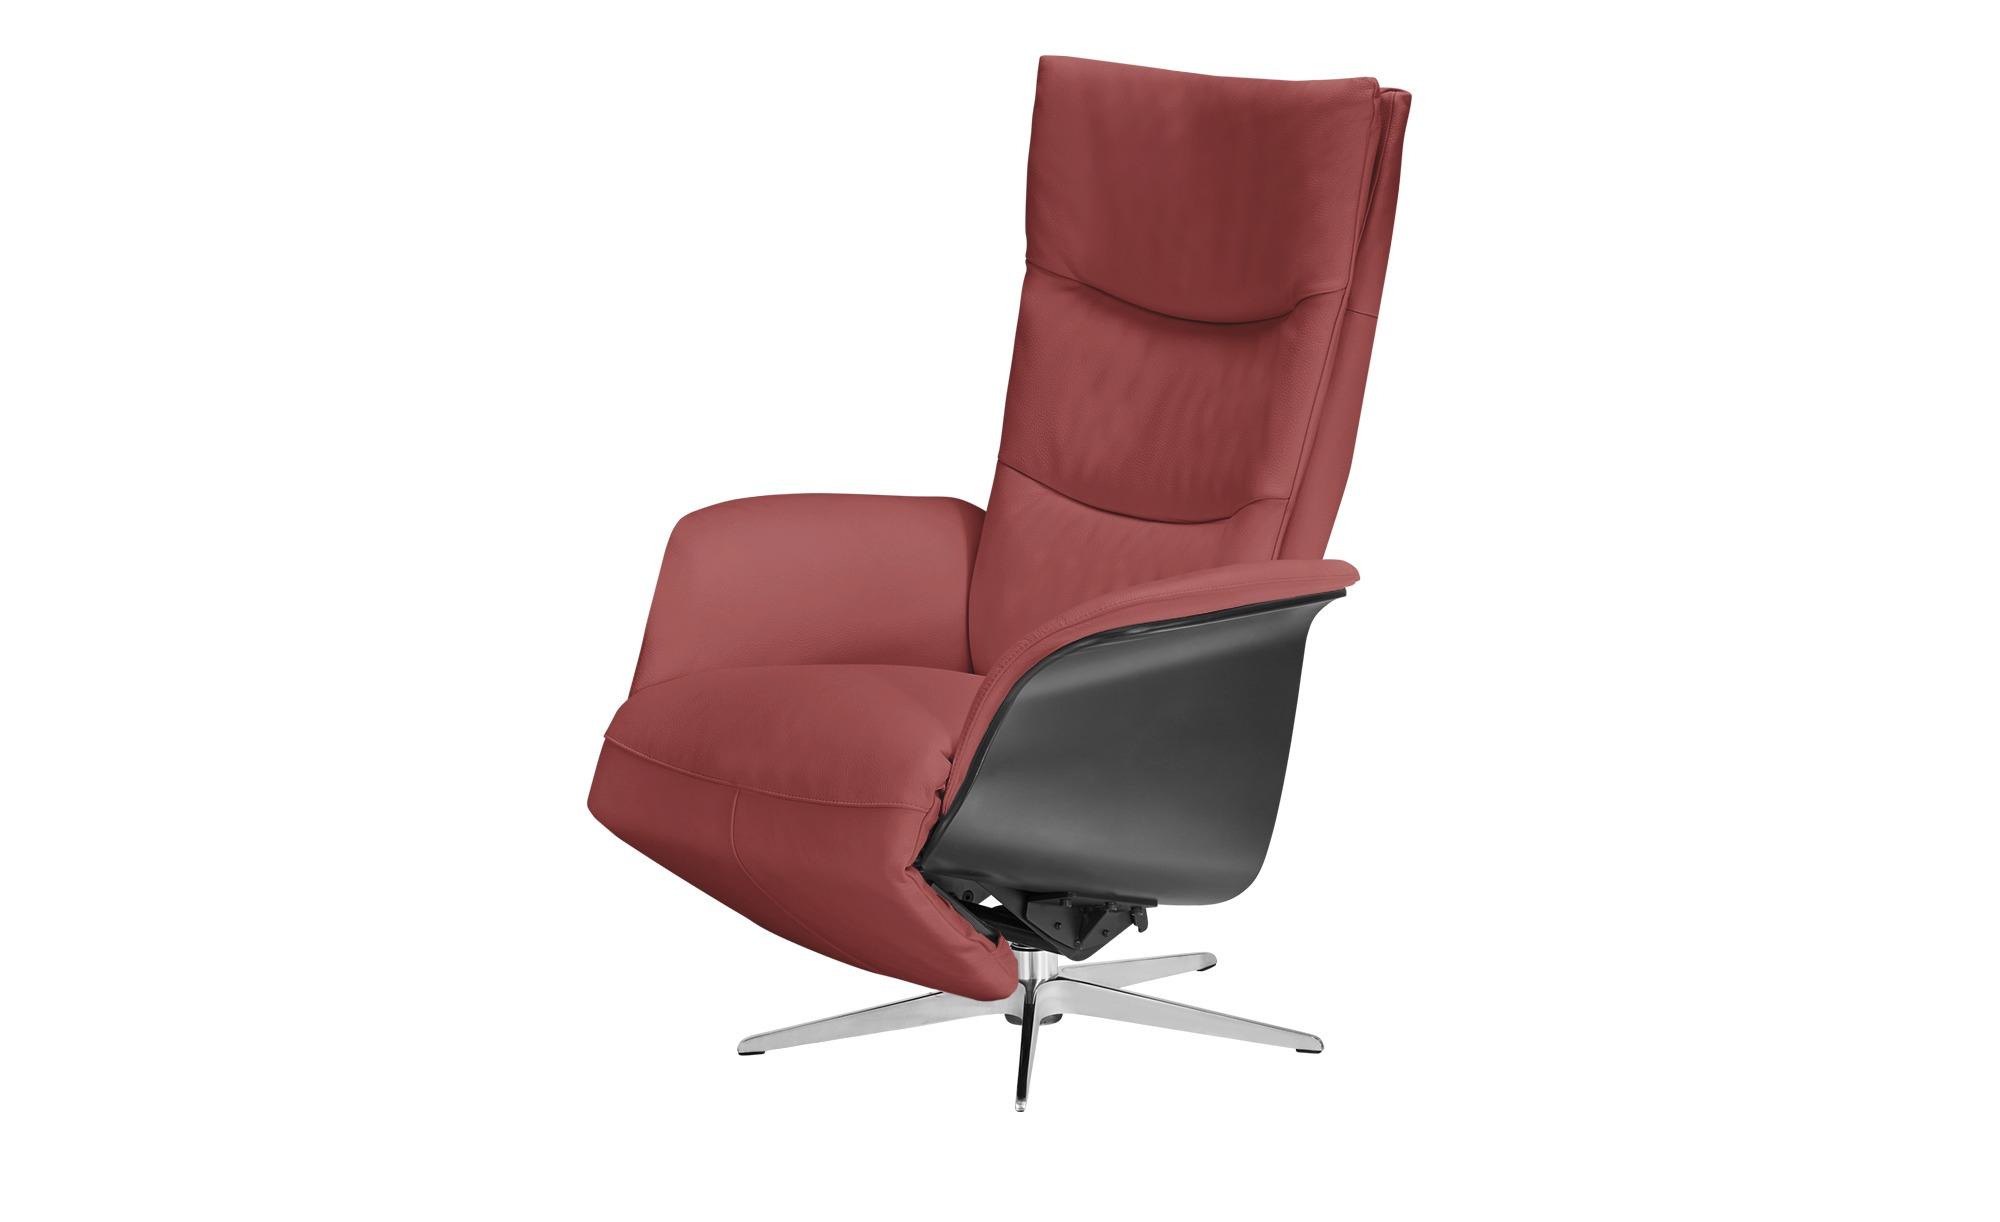 Relaxsessel rot - Leder Mika ¦ rot ¦ Maße (cm): B: 77 H: 109 T: 82 Polstermöbel > Sessel > Fernsehsessel - Höffner